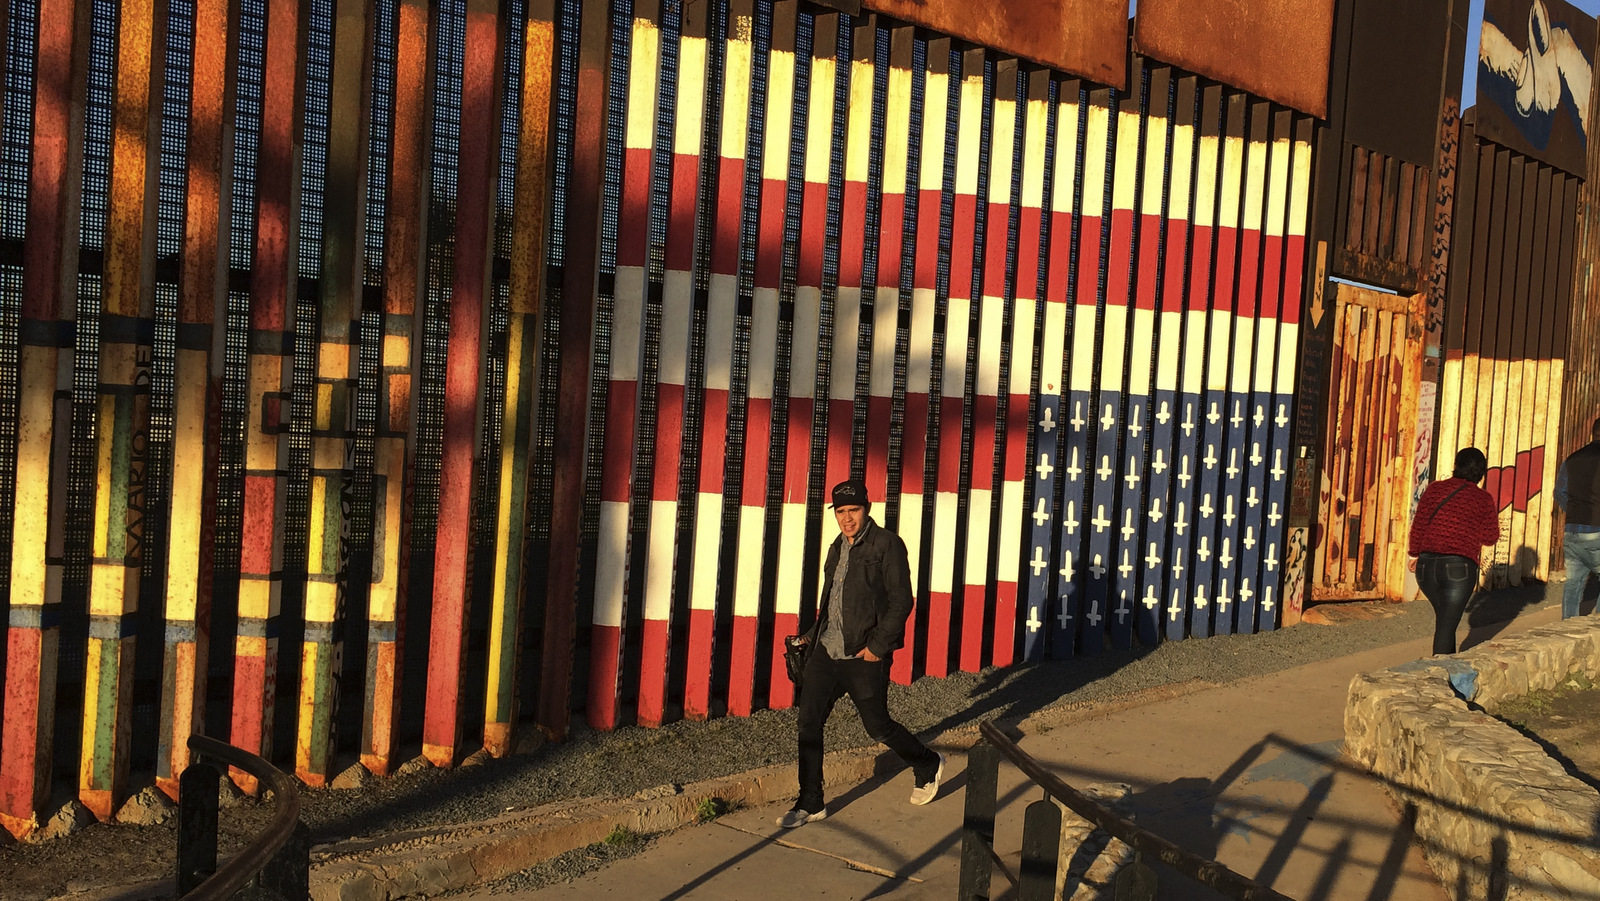 mexico moving forward essay